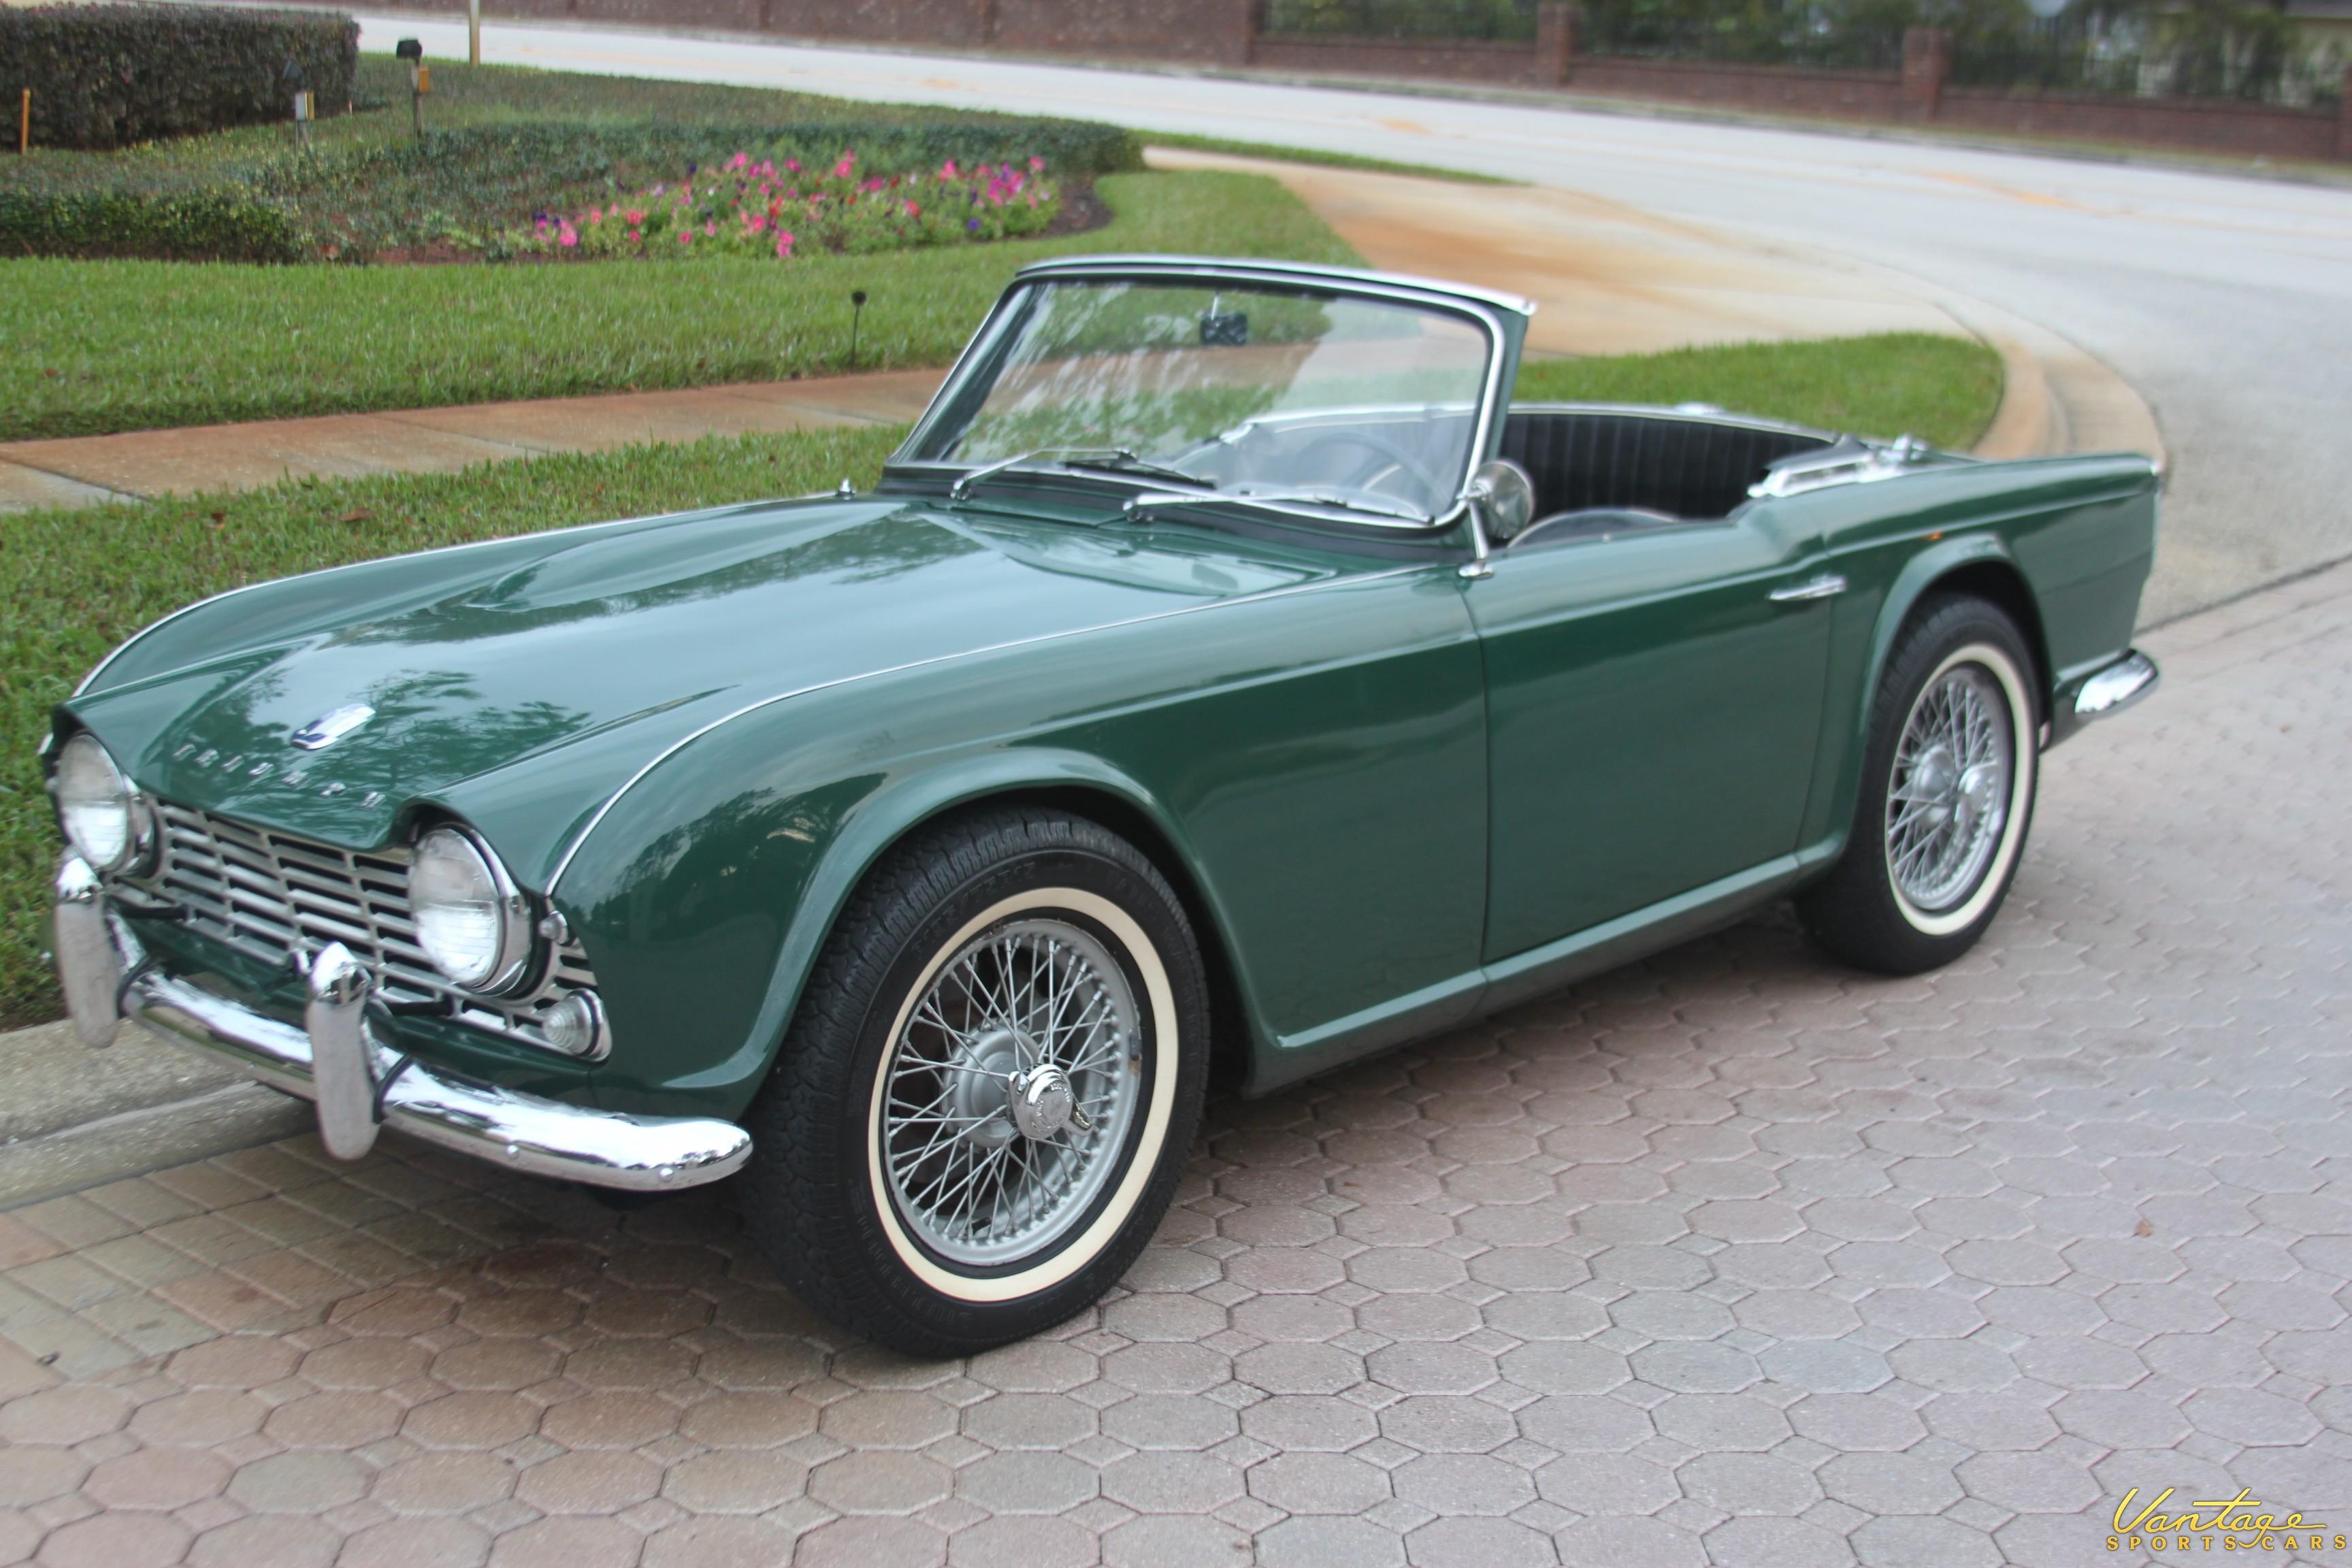 1963 Triumph Tr4 Sold Vantage Sports Cars Vantage